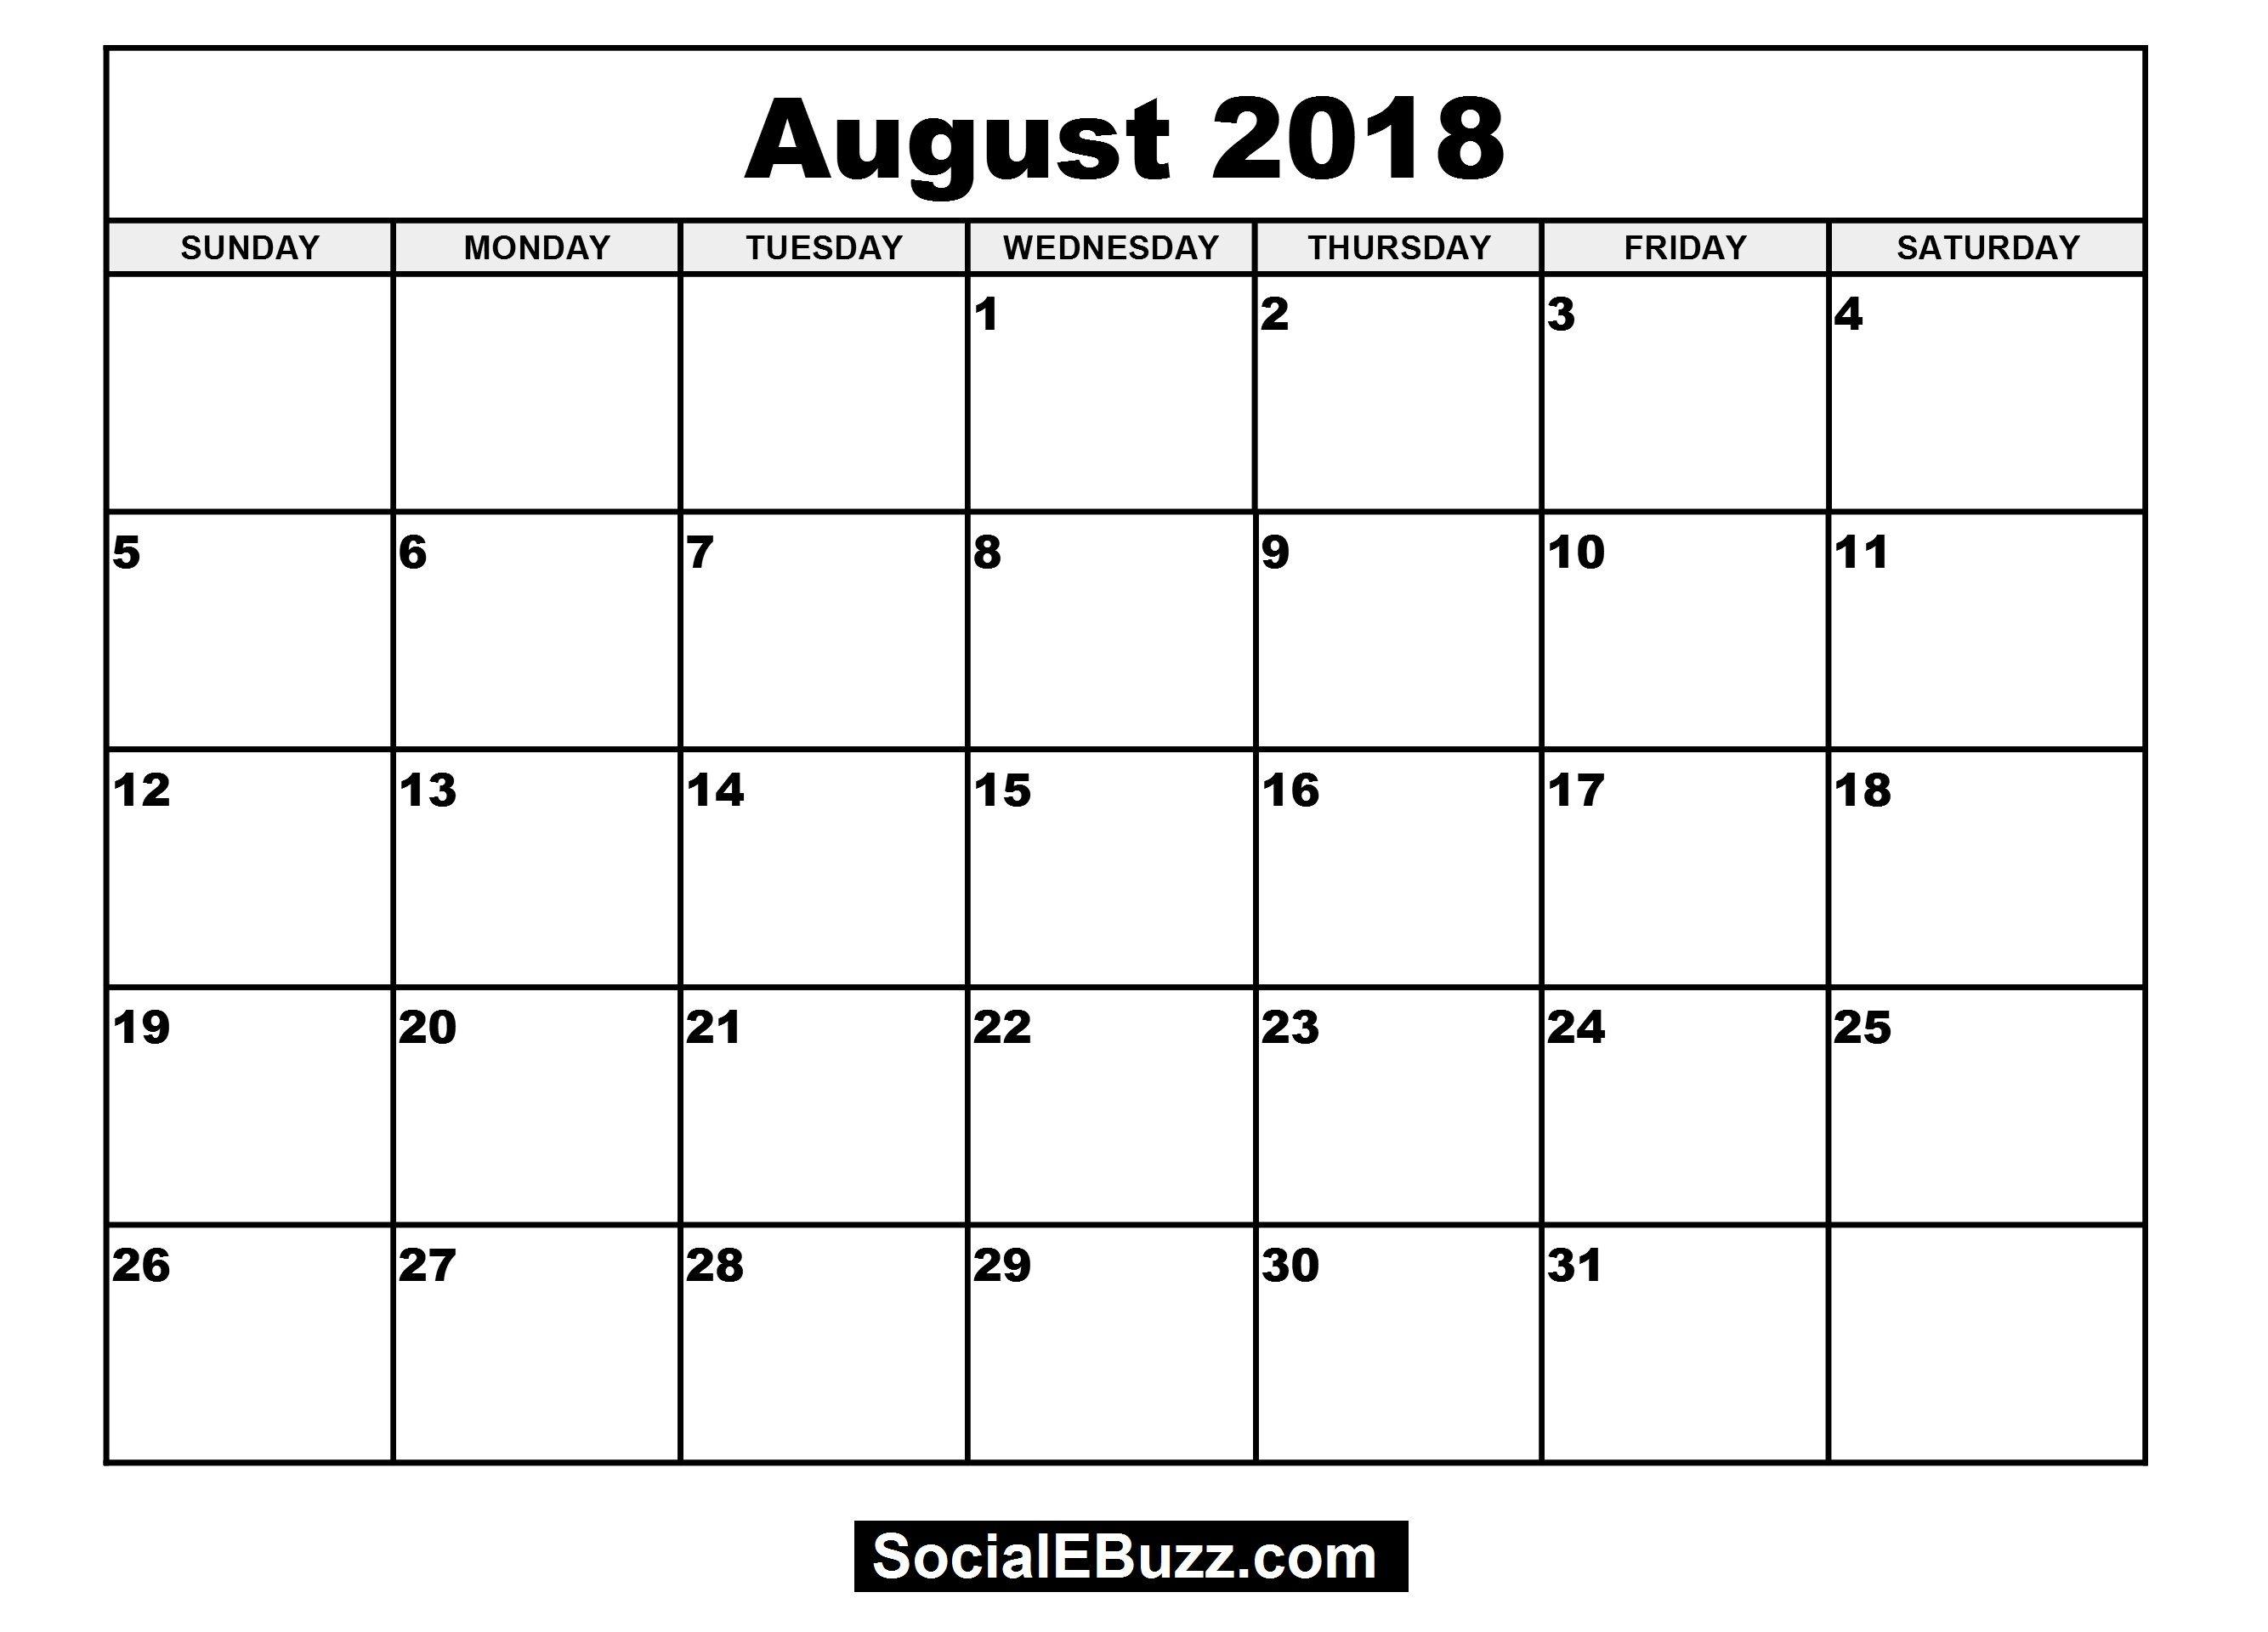 Pincalendar Printable On August 2018 Calendar | 2018 Calendar with Blank Calendar Printable August